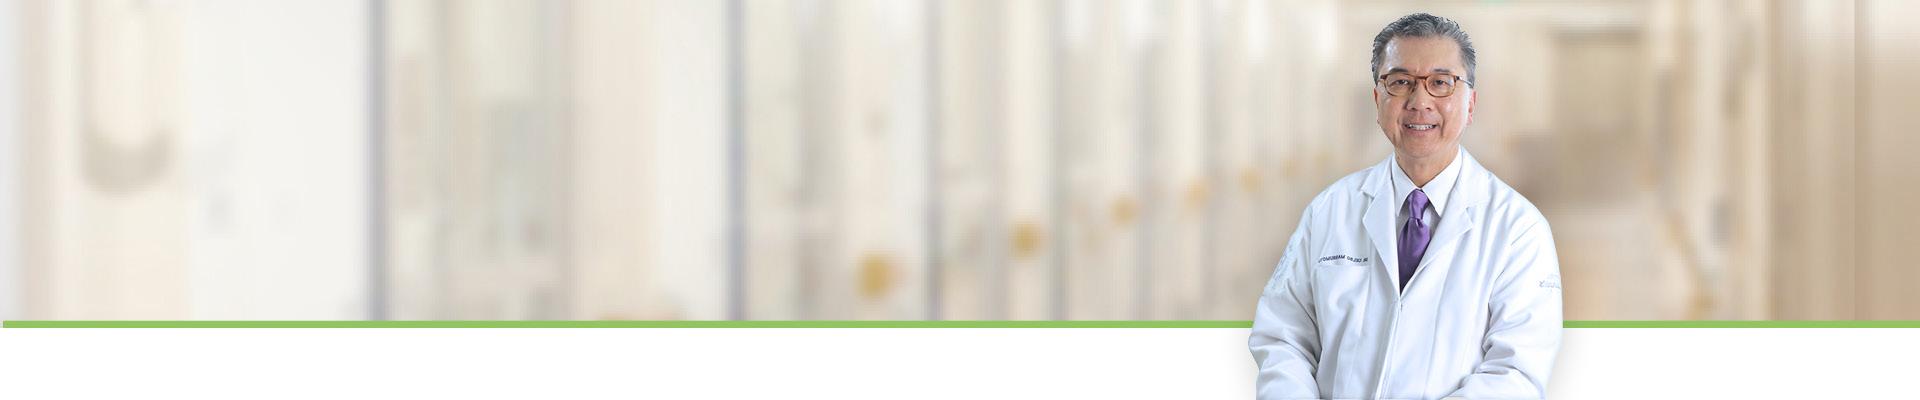 Banner 13 blank linfoma de hodgkin